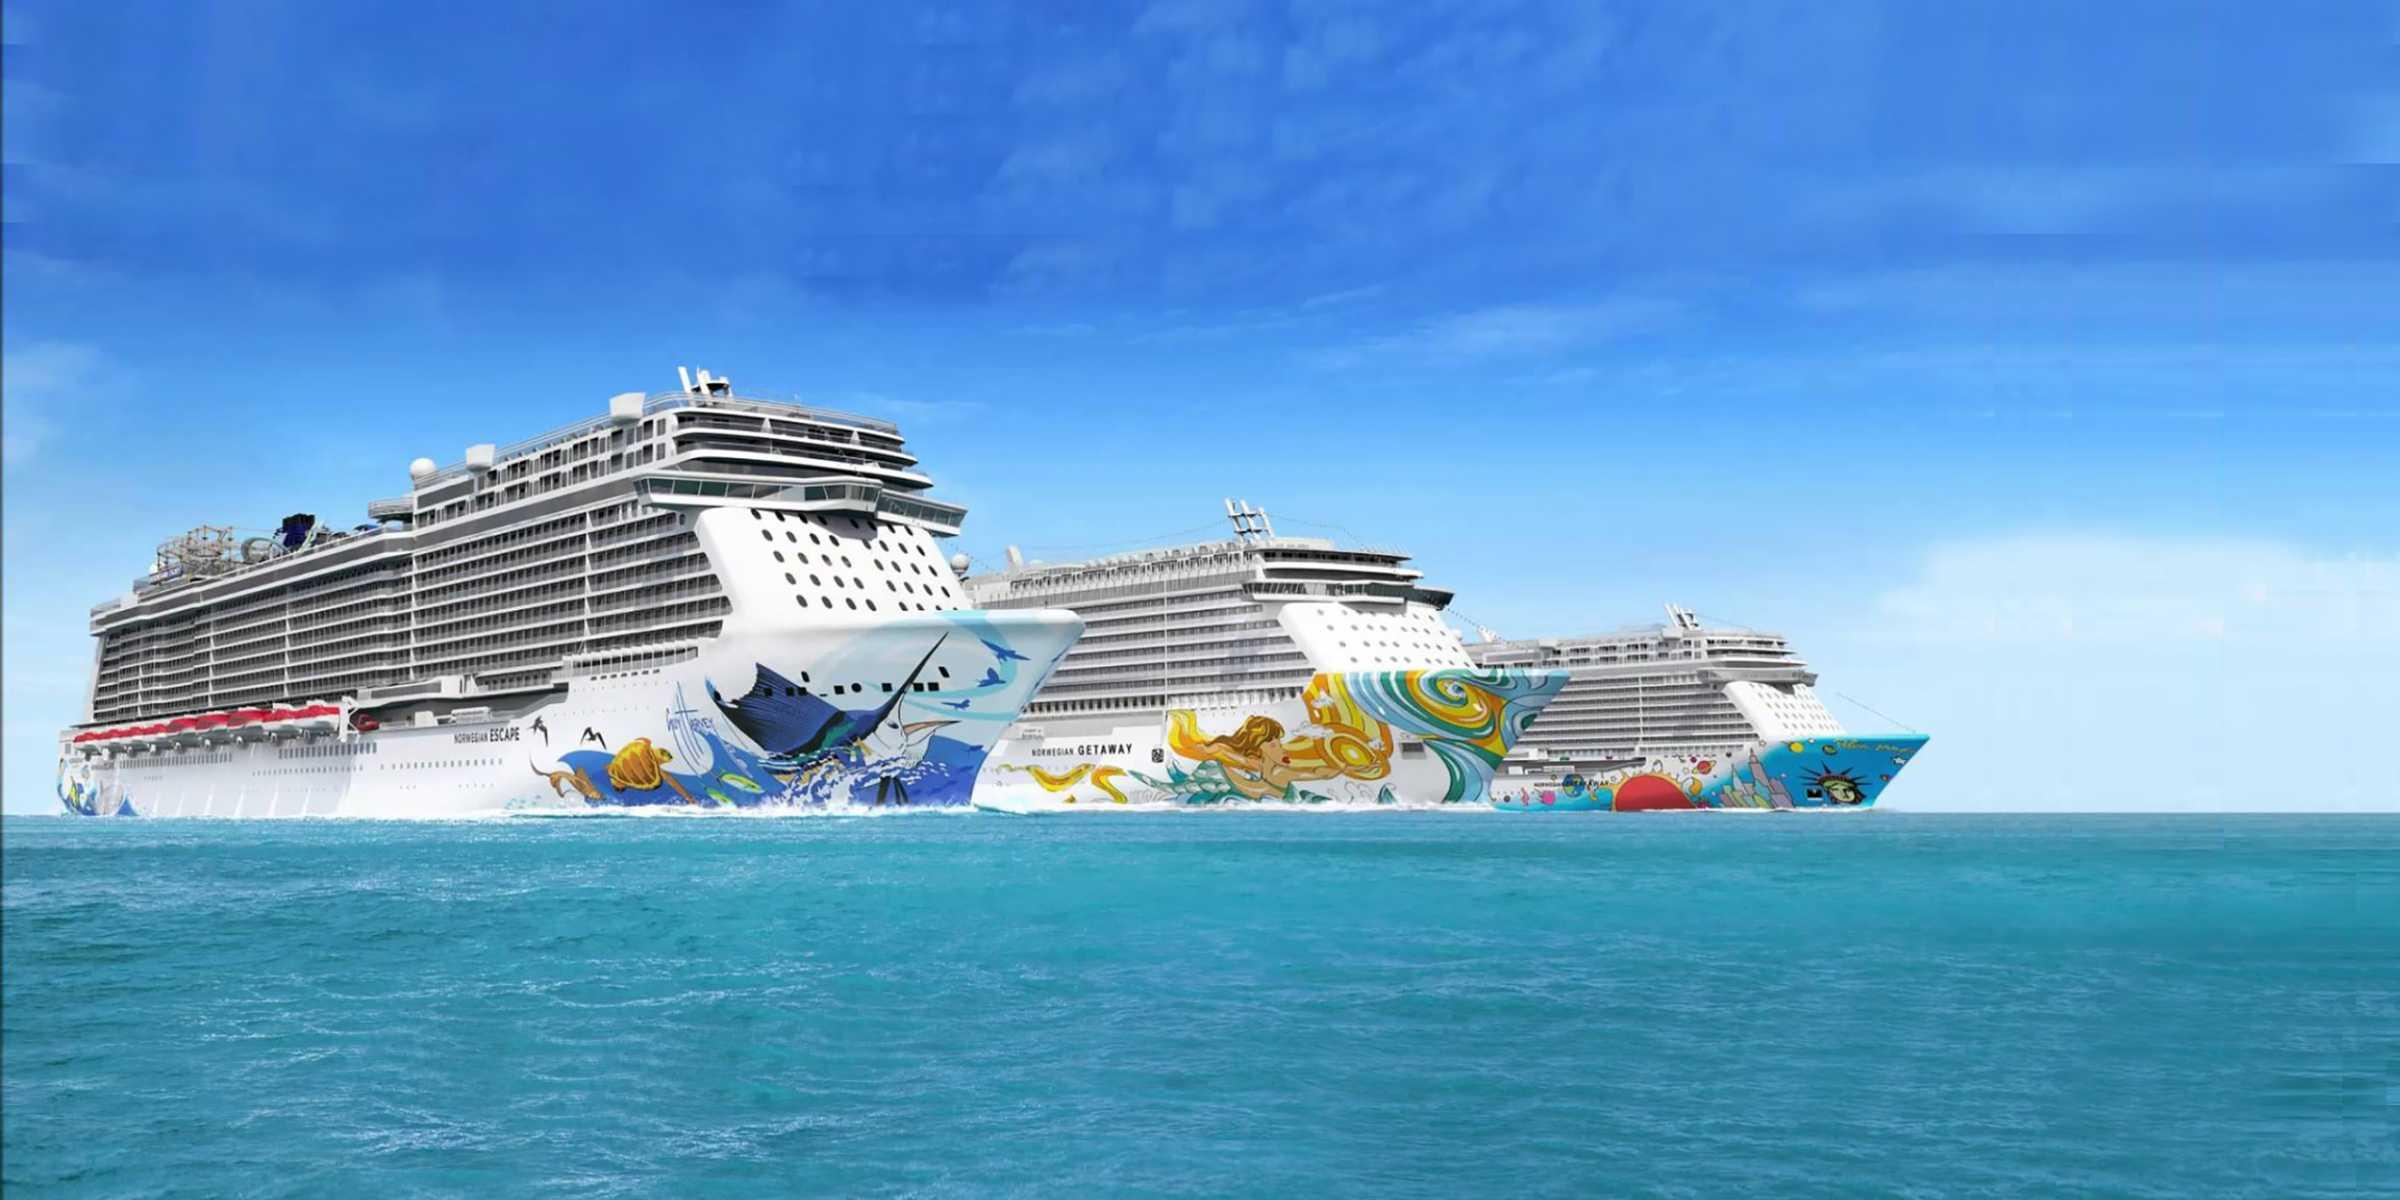 7-night Norwegian Cruise Line cruises in the Caribbean  $399